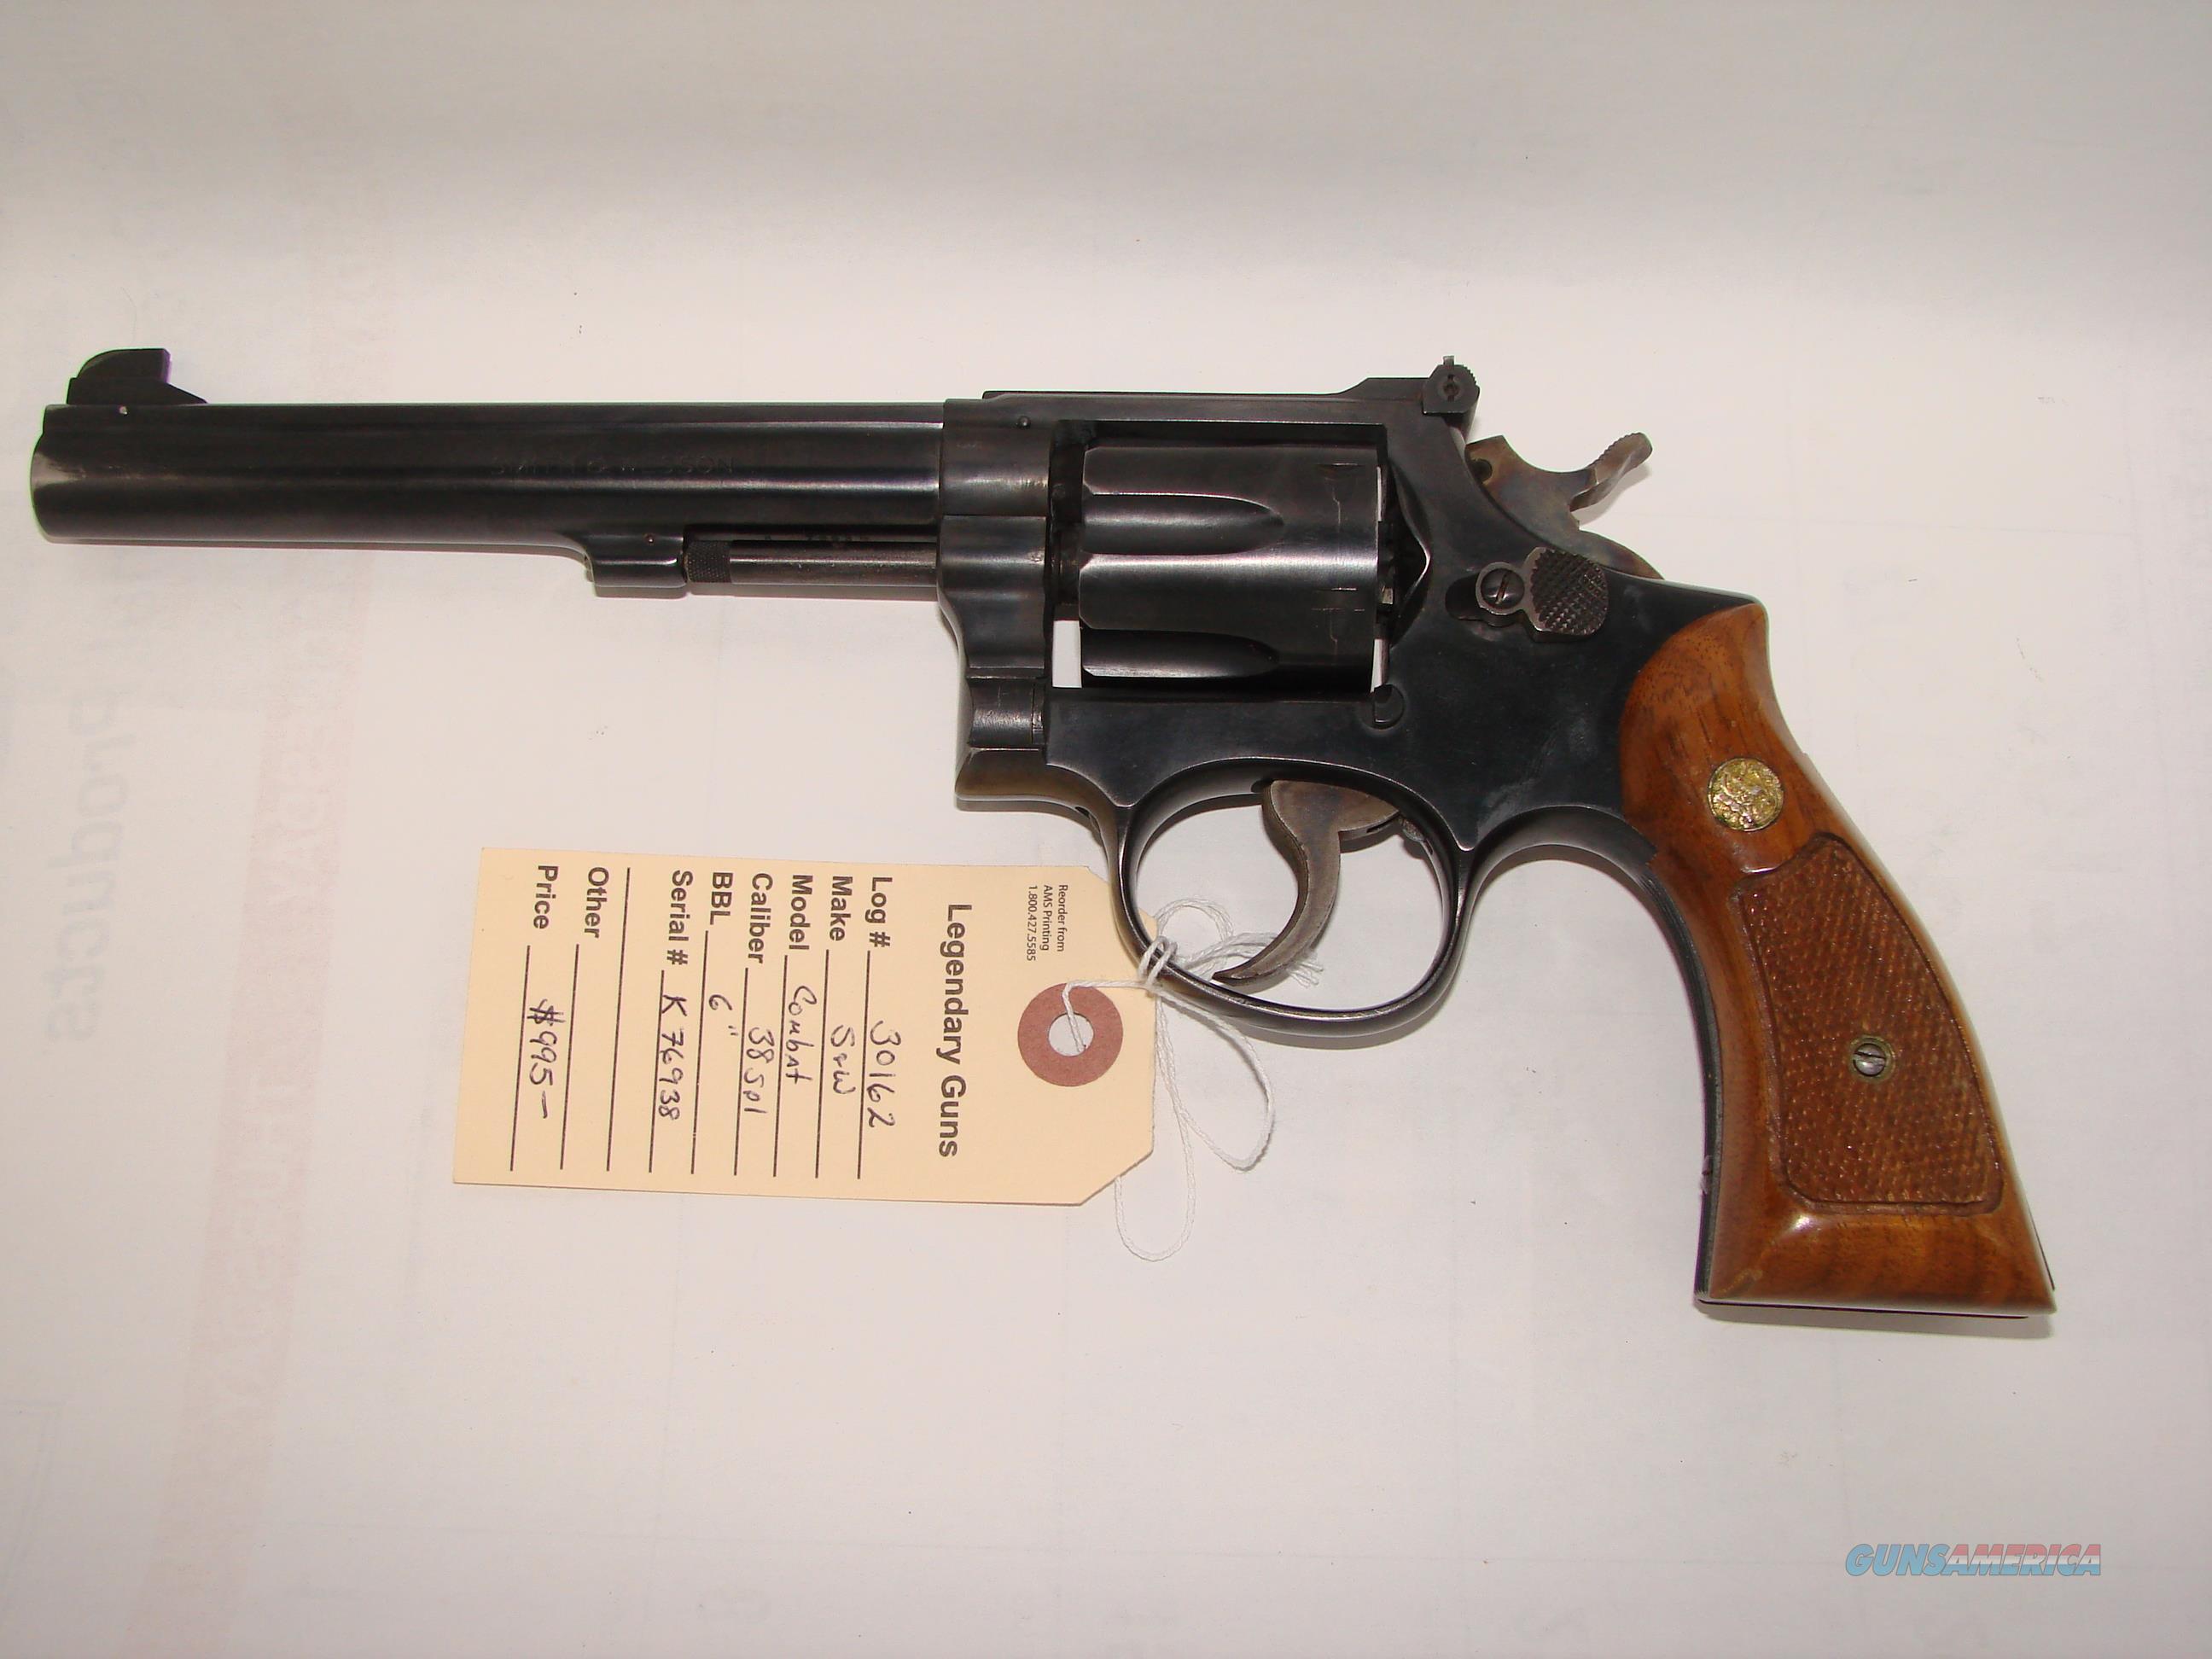 S&W Combat Masterpiece  Guns > Pistols > Smith & Wesson Revolvers > Med. Frame ( K/L )